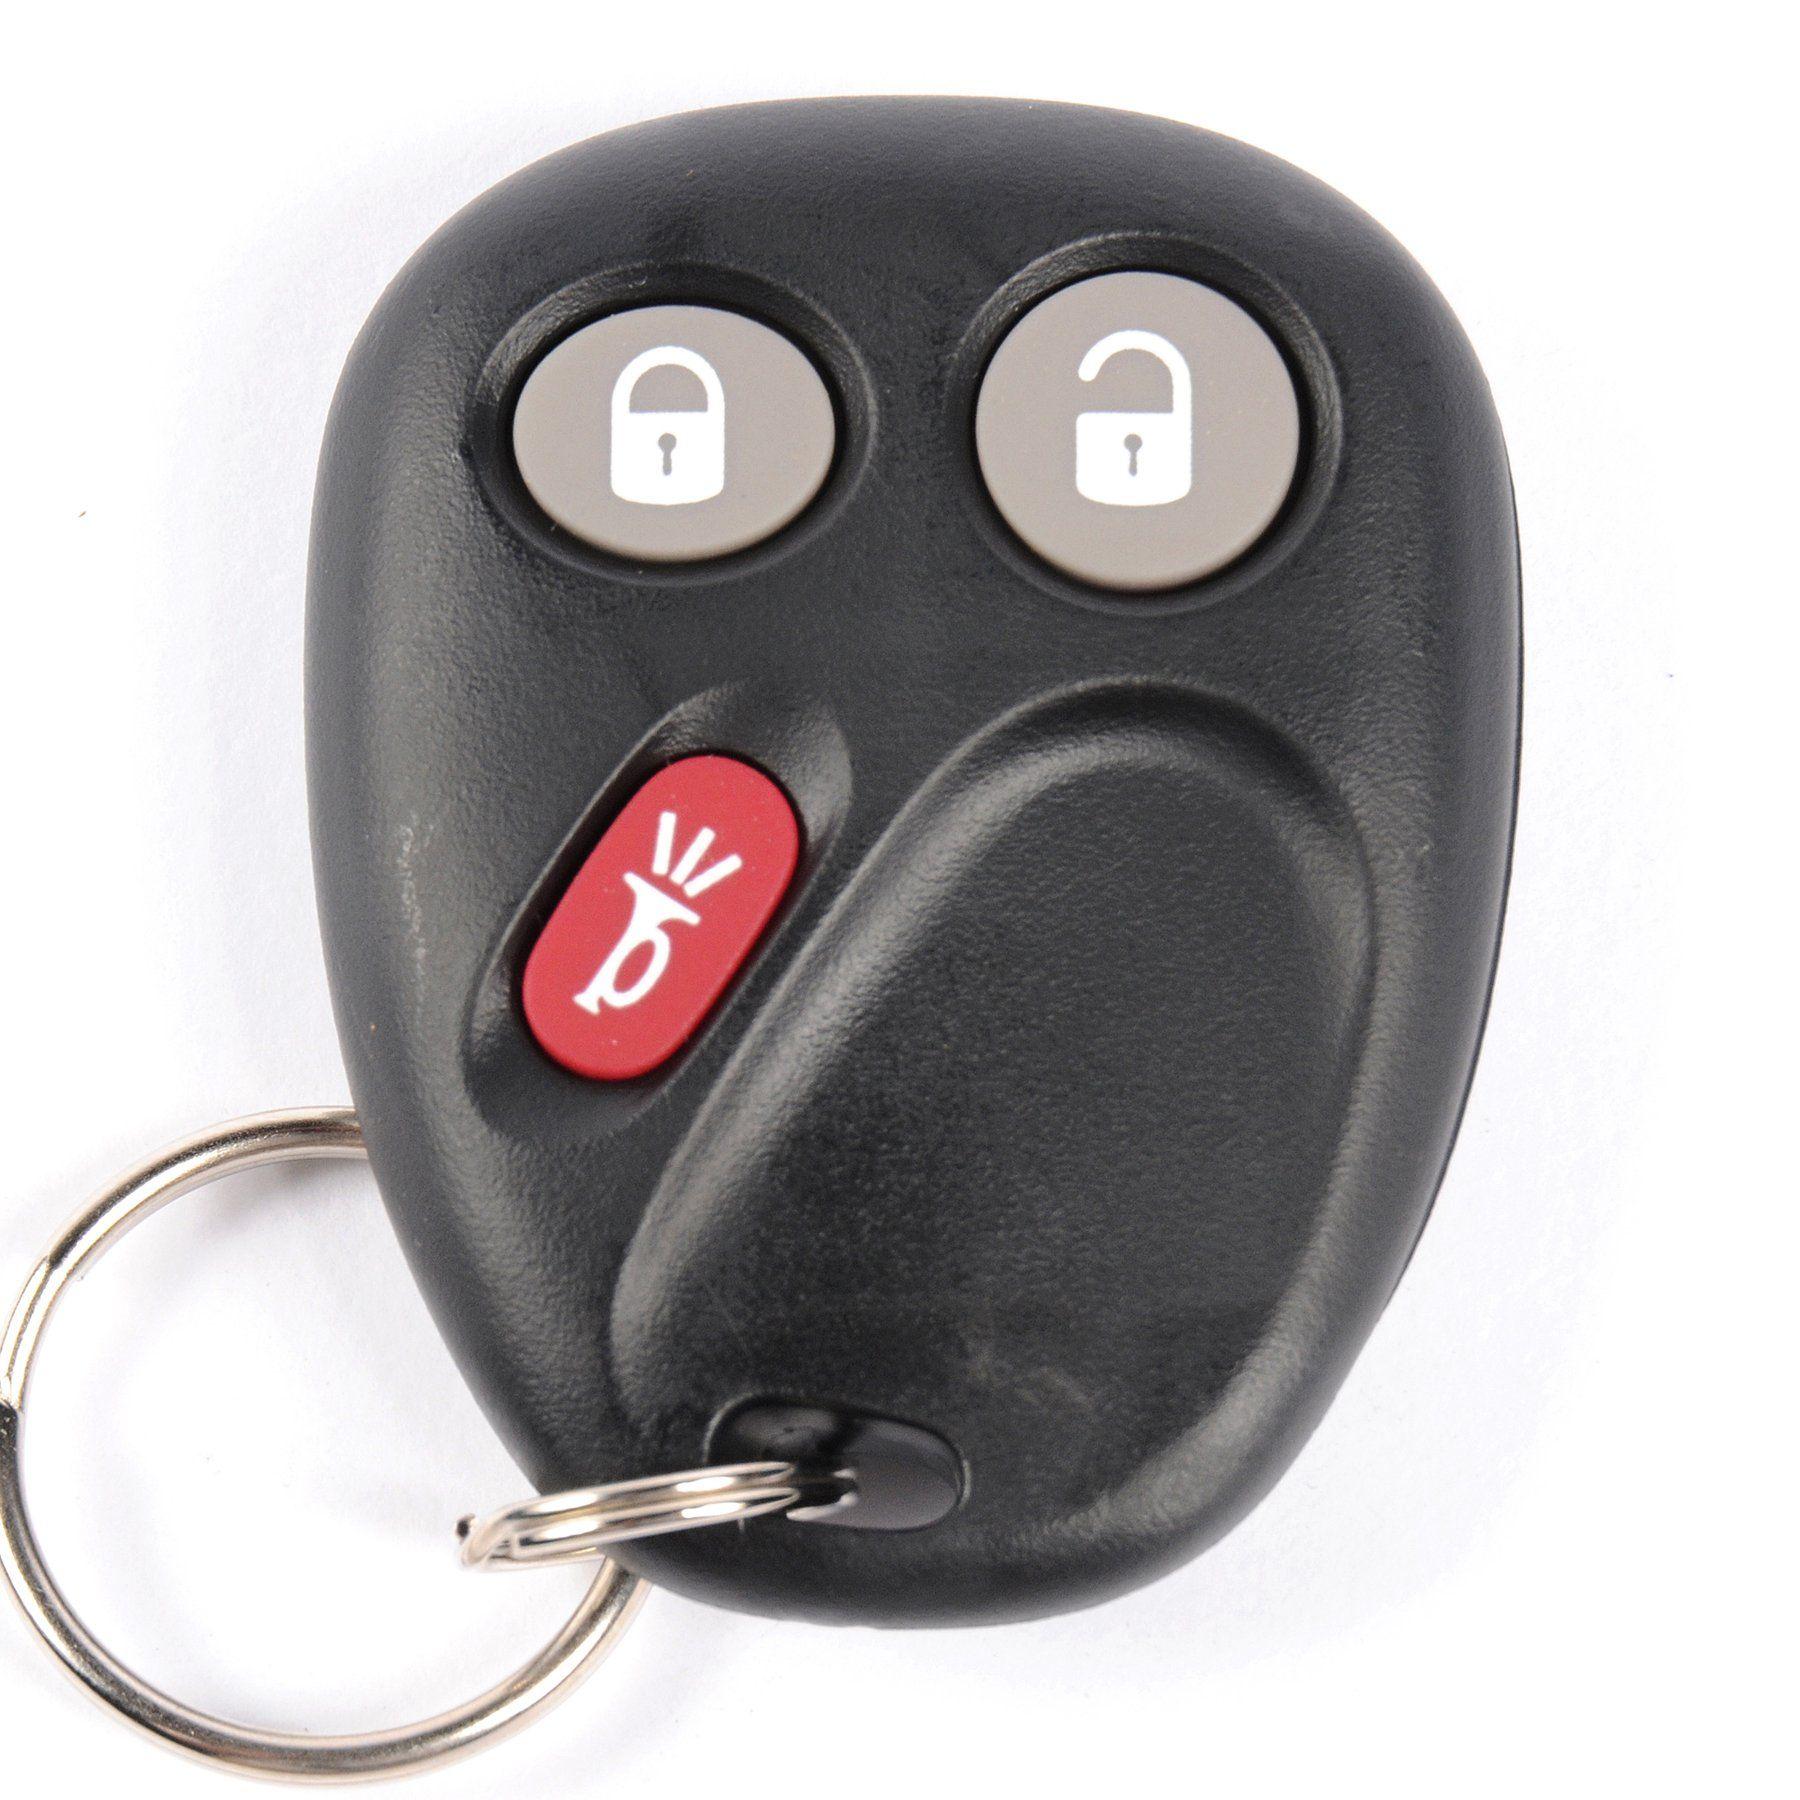 Acdelco 15051014 Gm Original Equipment 3 Button Keyless Entry